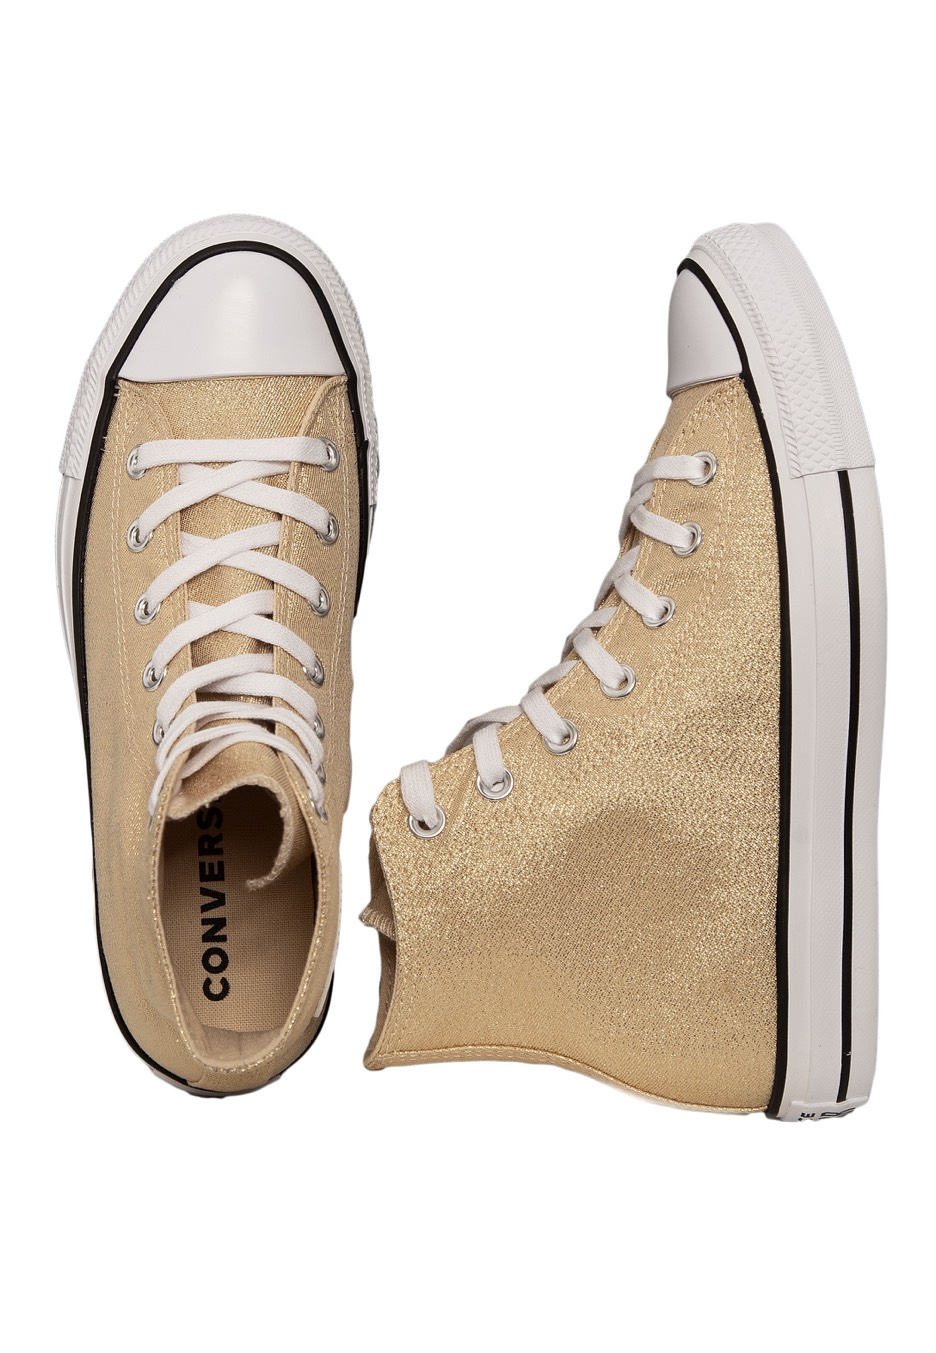 converse light beige